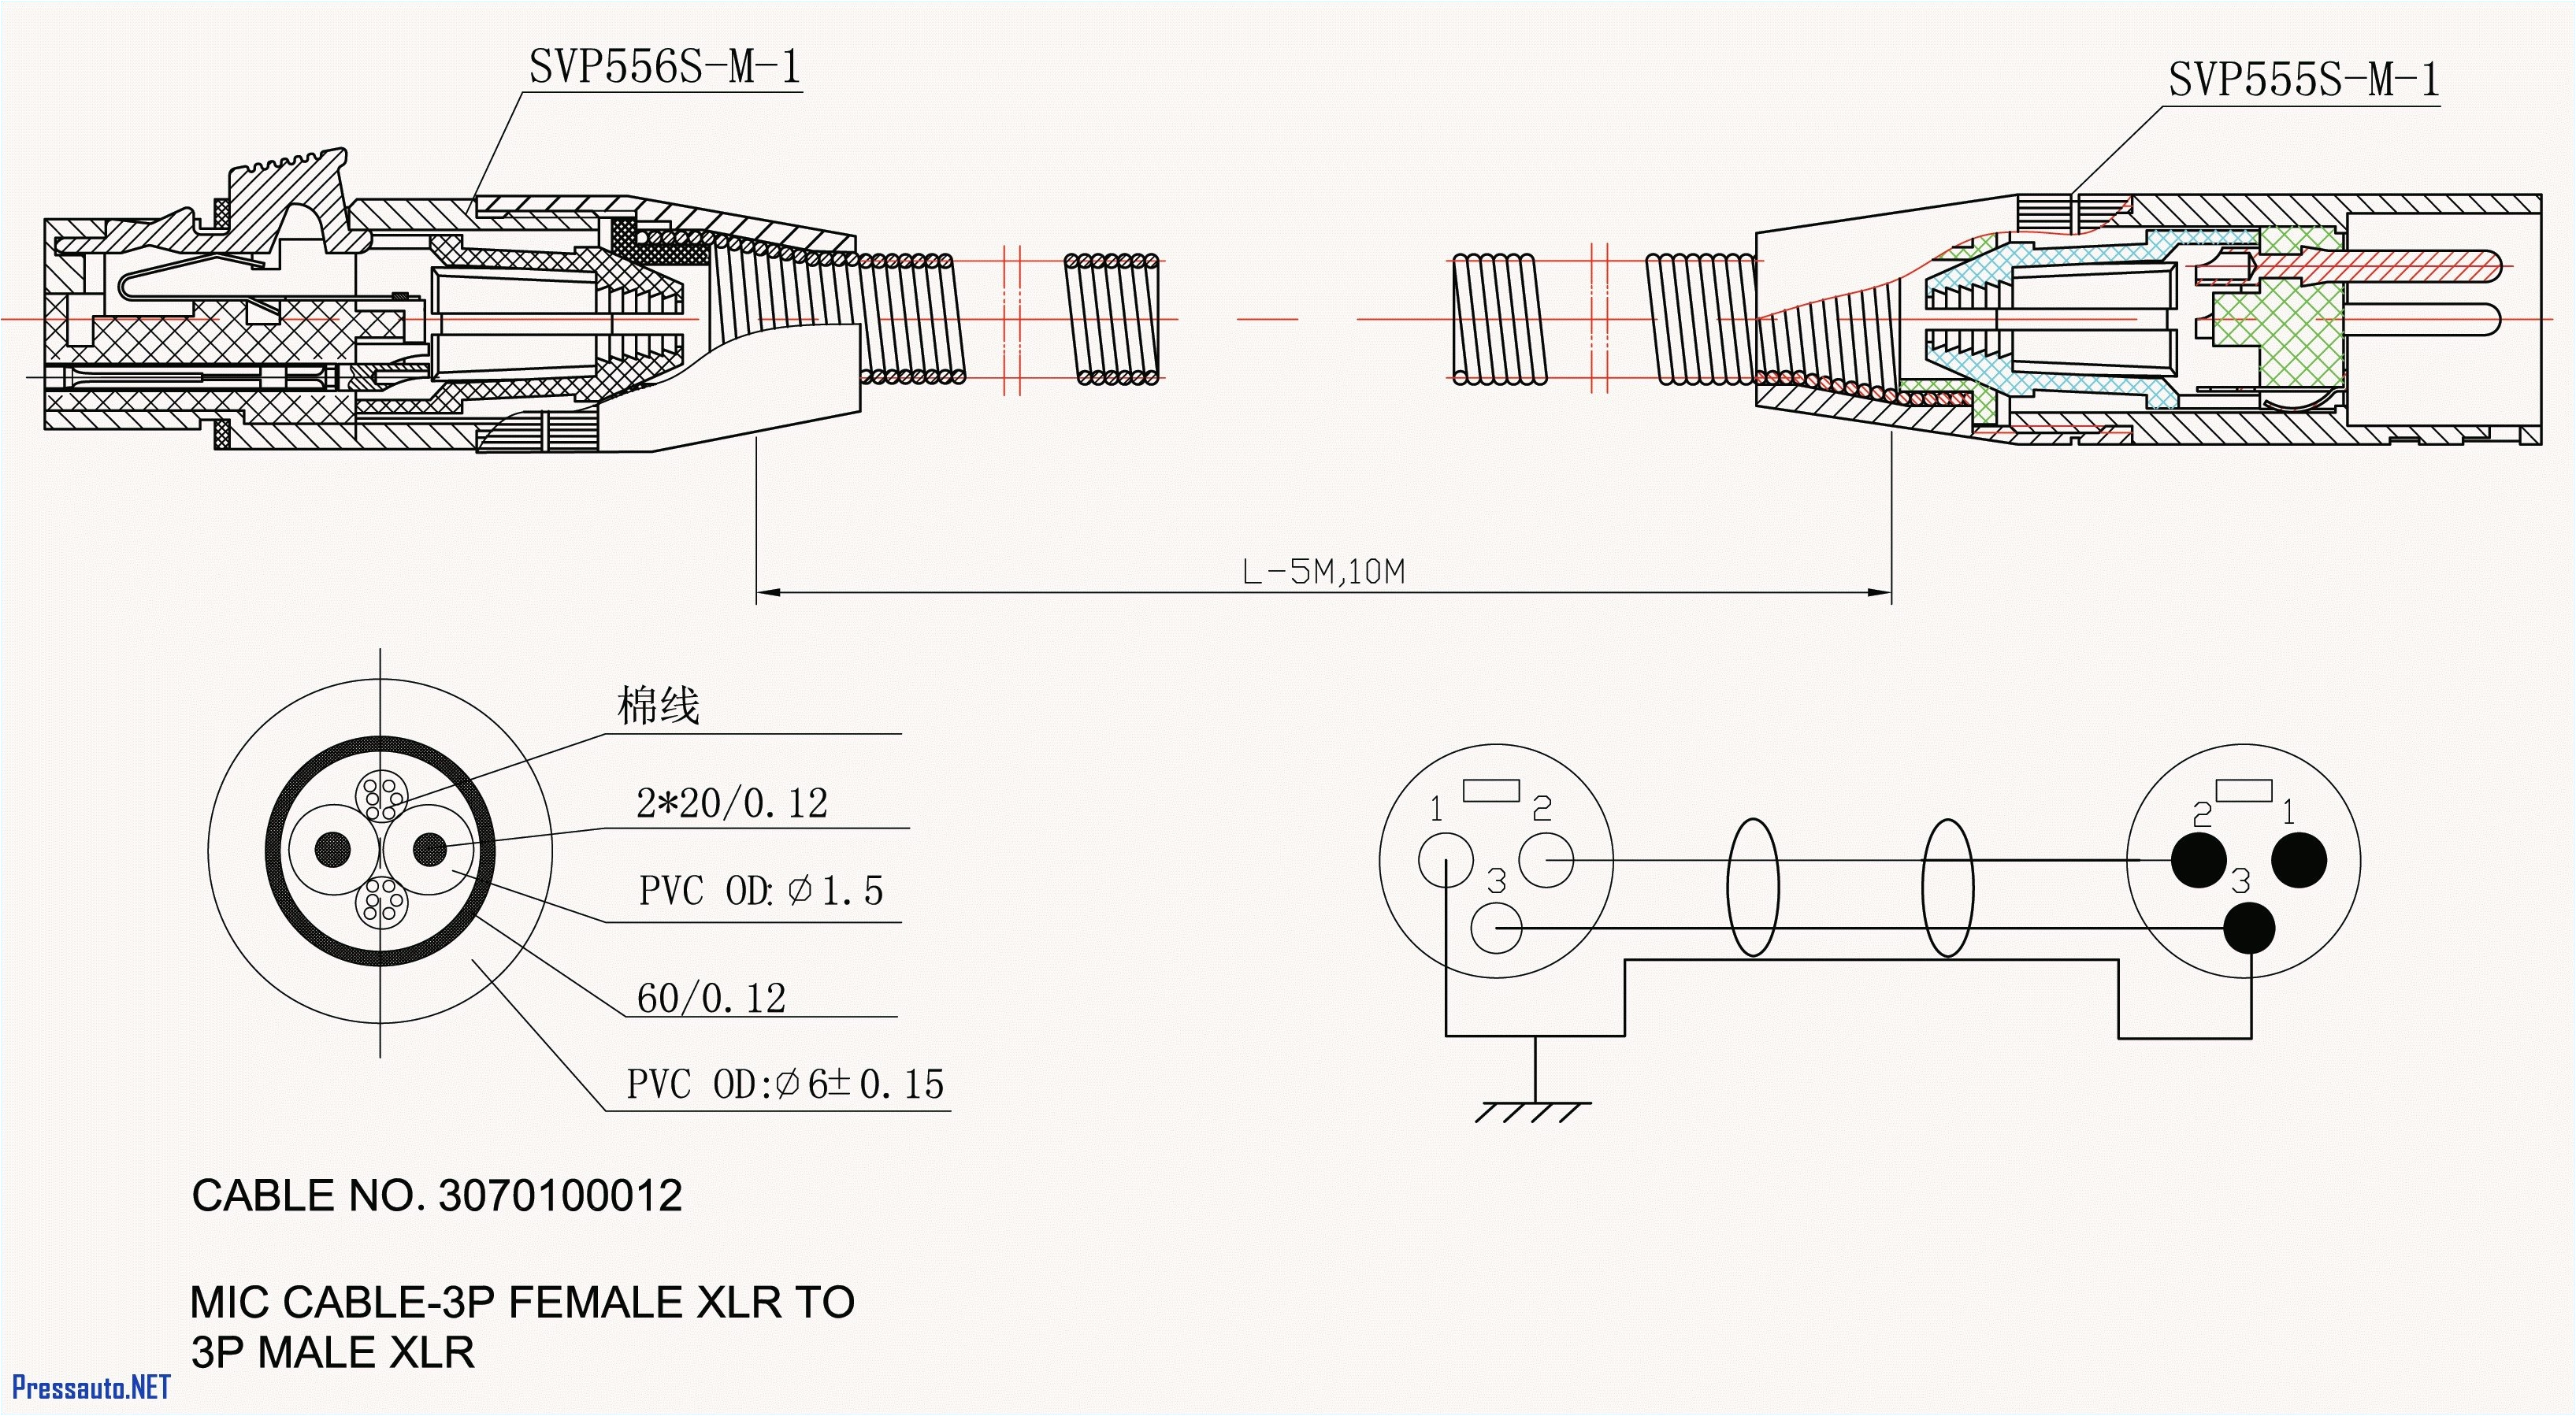 4 wire 220 diagram wiring diagram centre 4 wire 220 schematic diagram